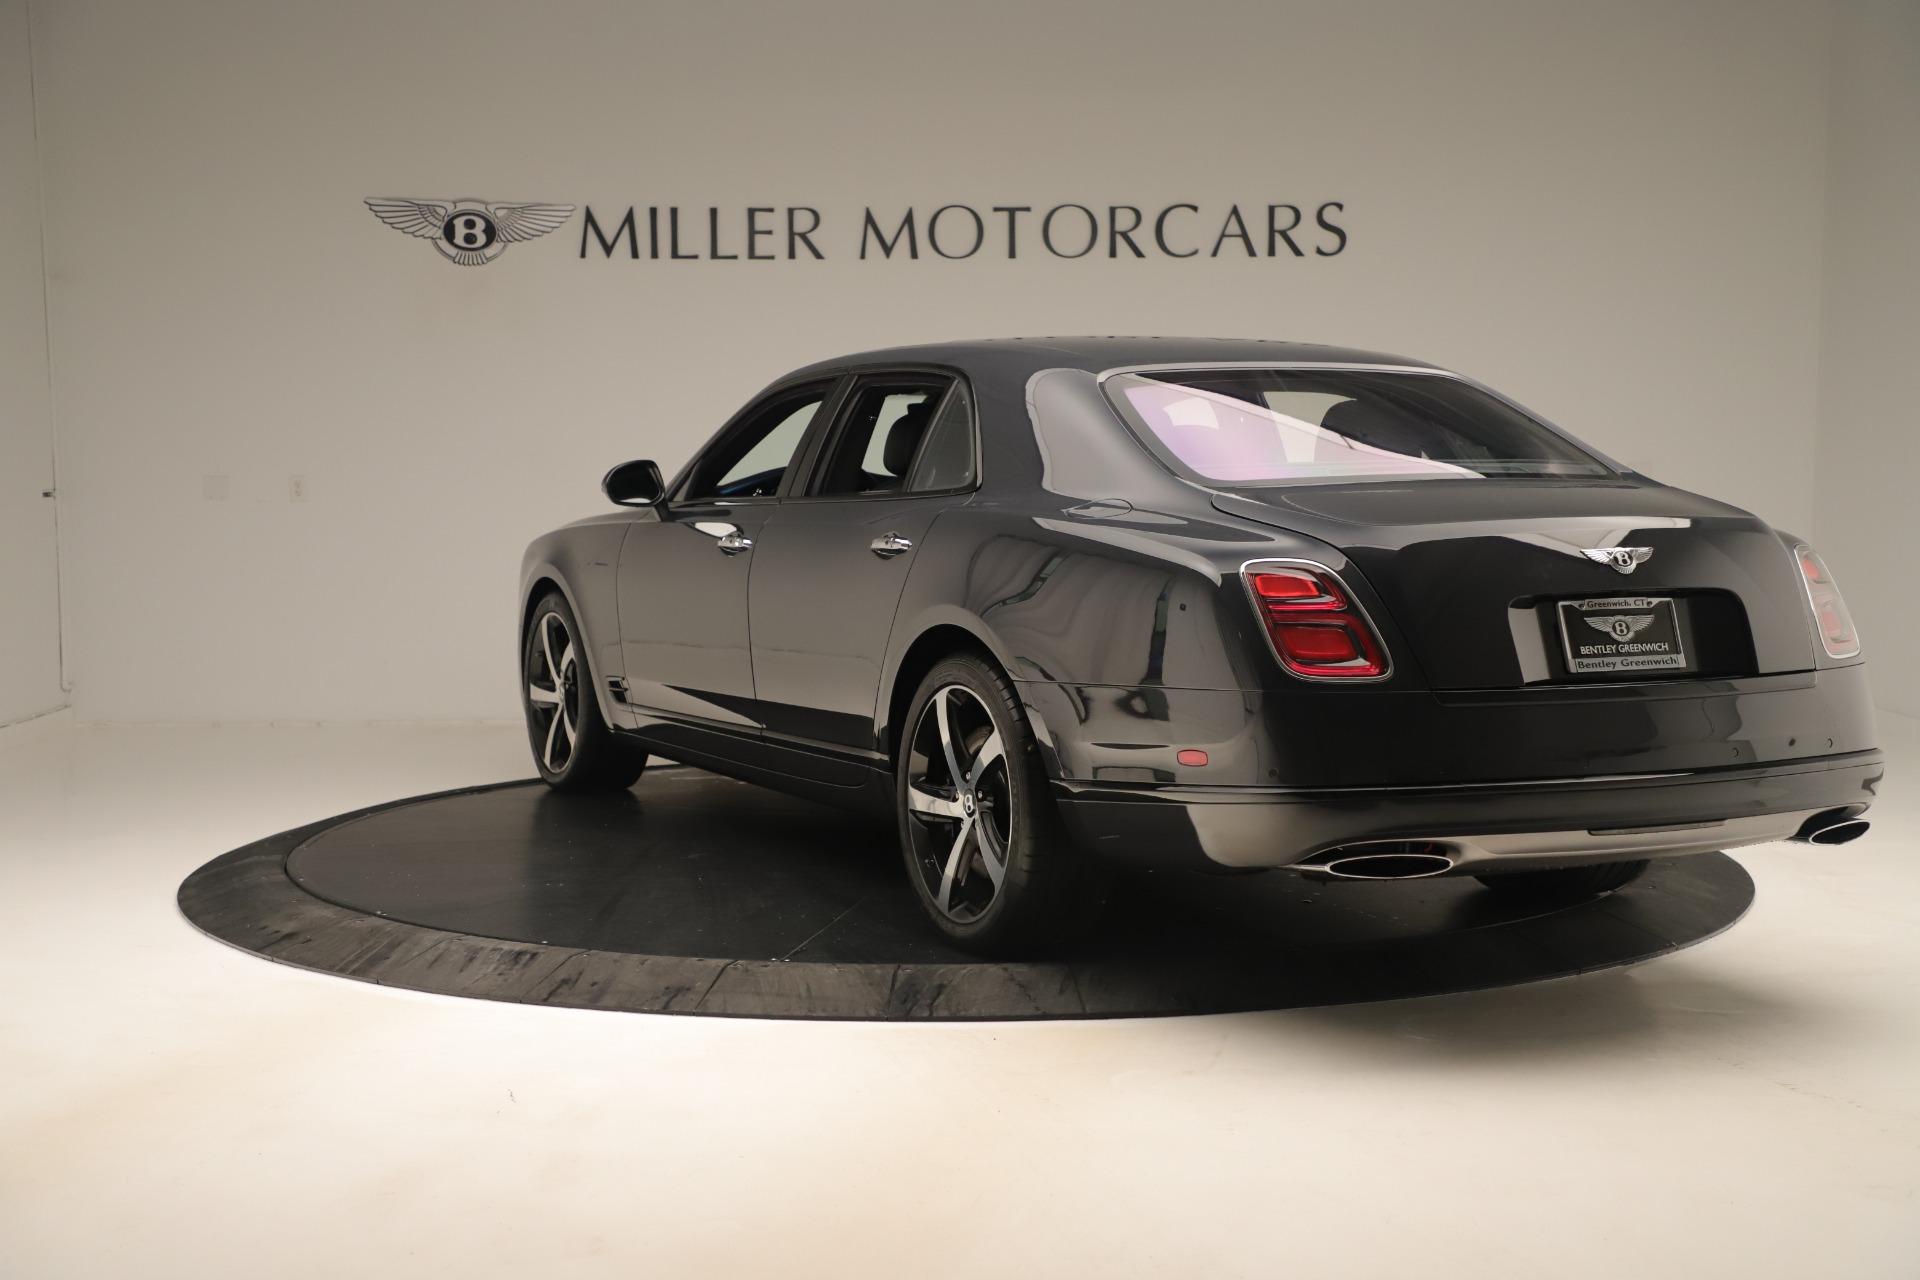 Used 2018 Bentley Mulsanne Speed Design Series For Sale In Westport, CT 3405_p5